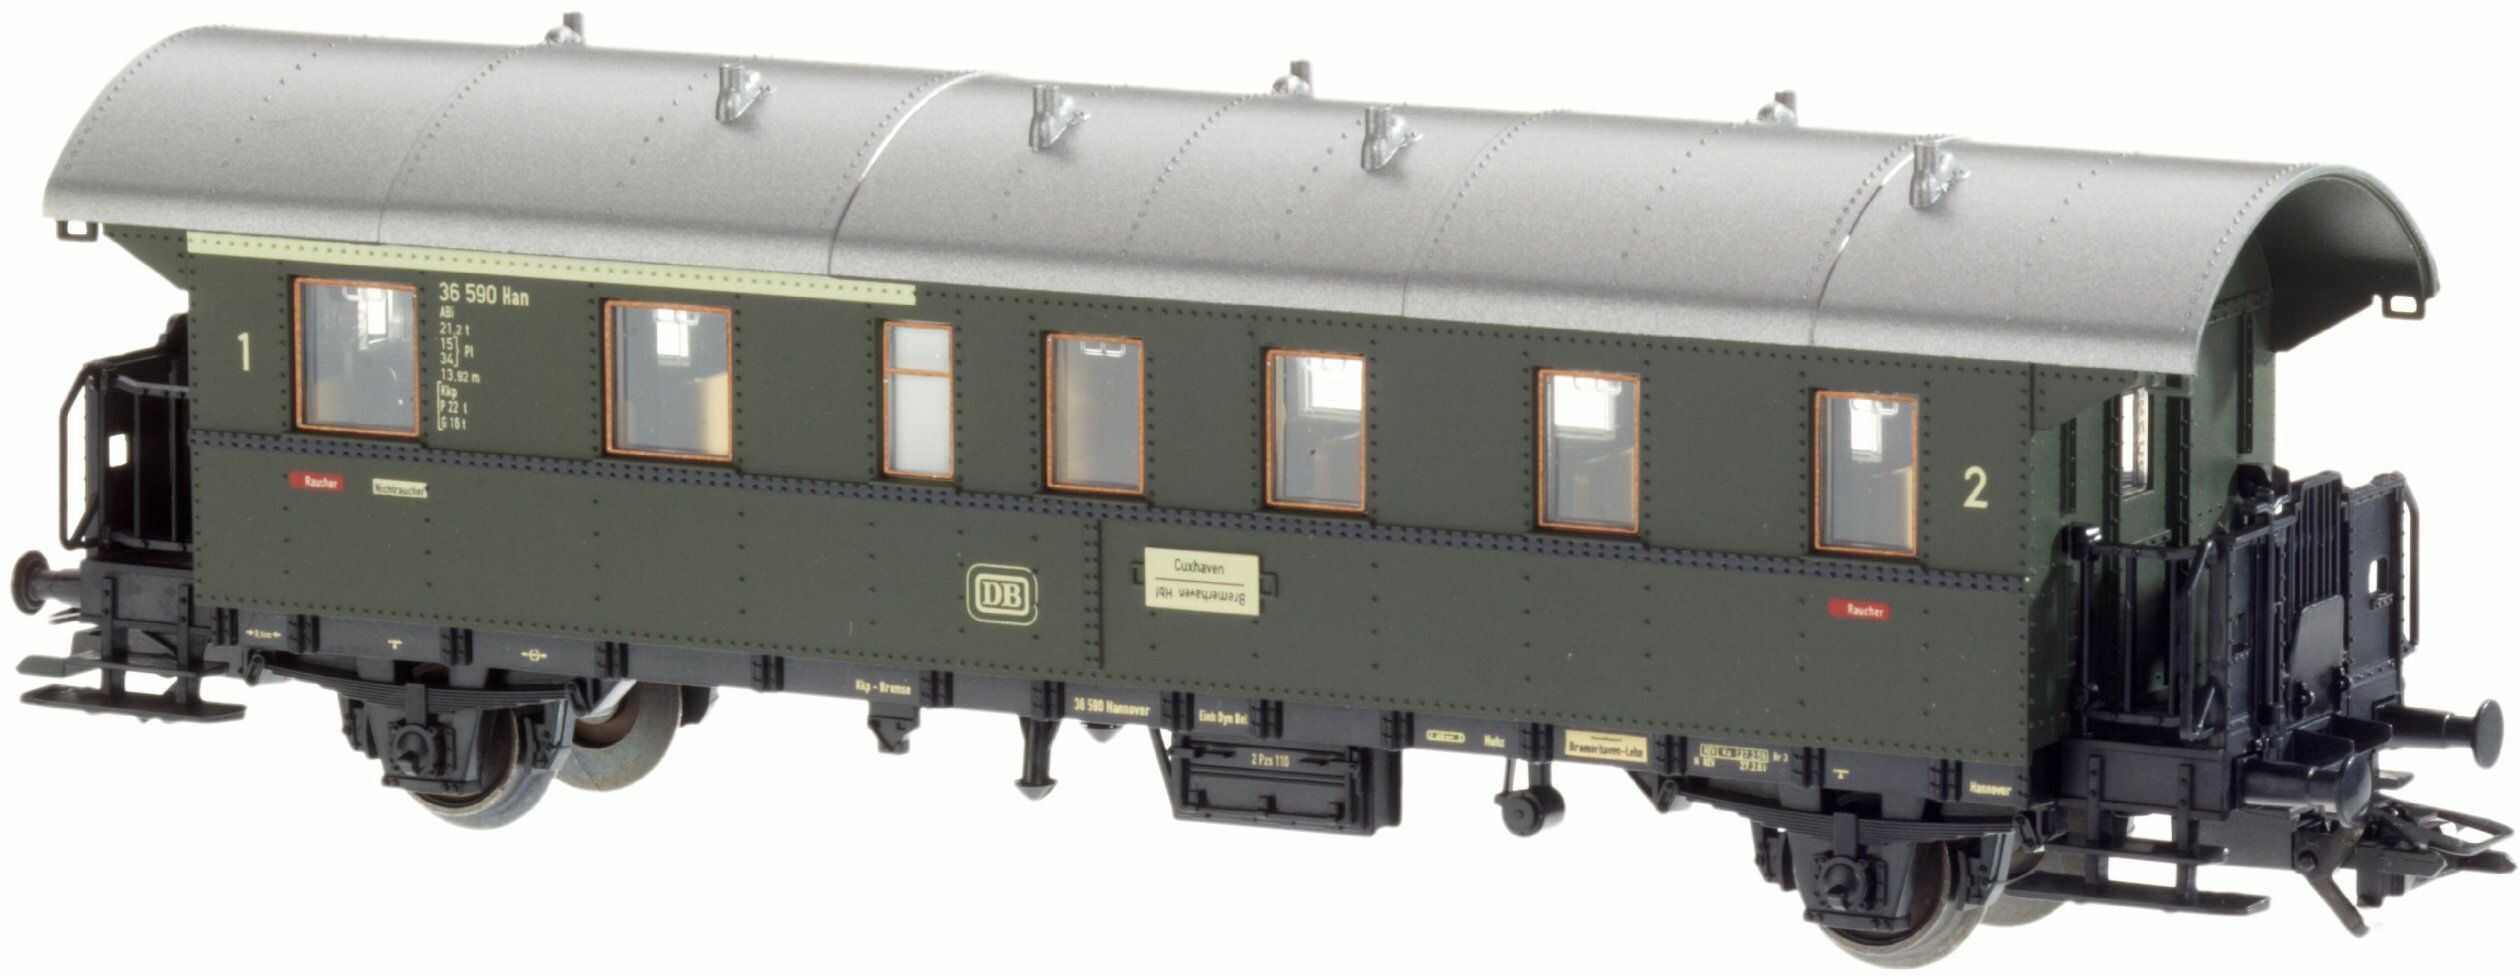 Märklin 4313 Klasyczny model kolejki samochód osobowy, tor H0